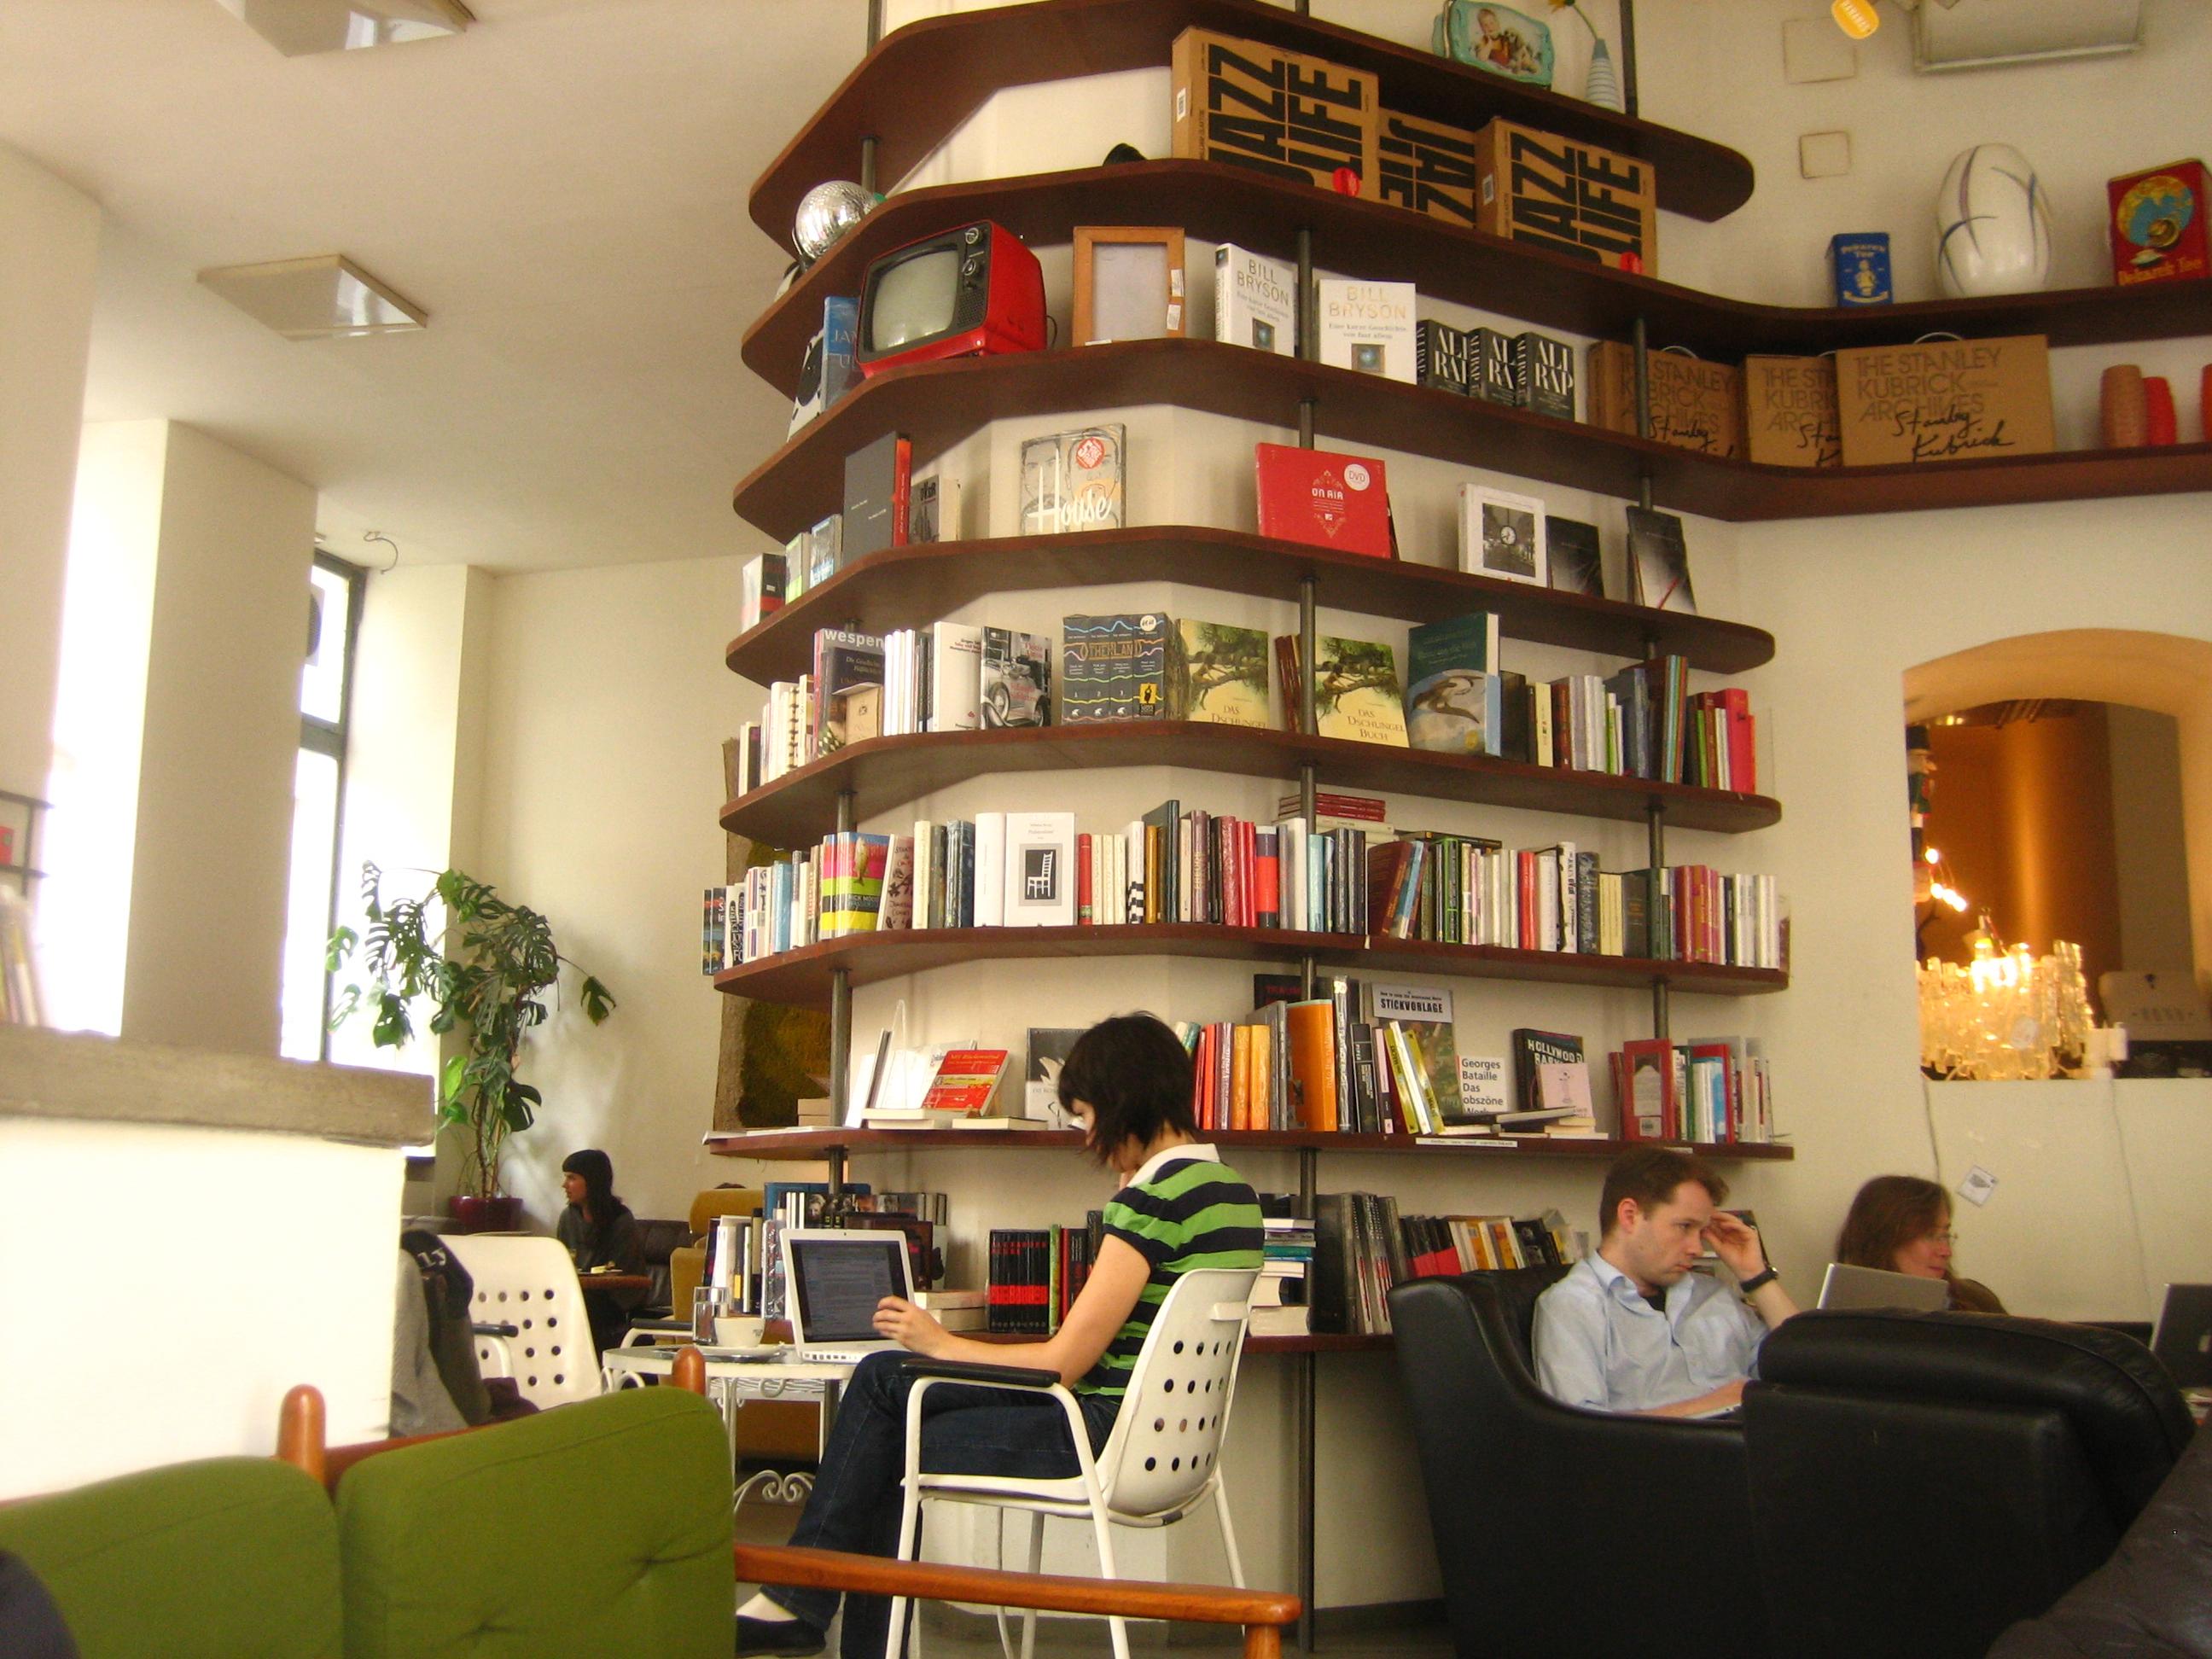 wireless Internet service provider - Aviat Networks